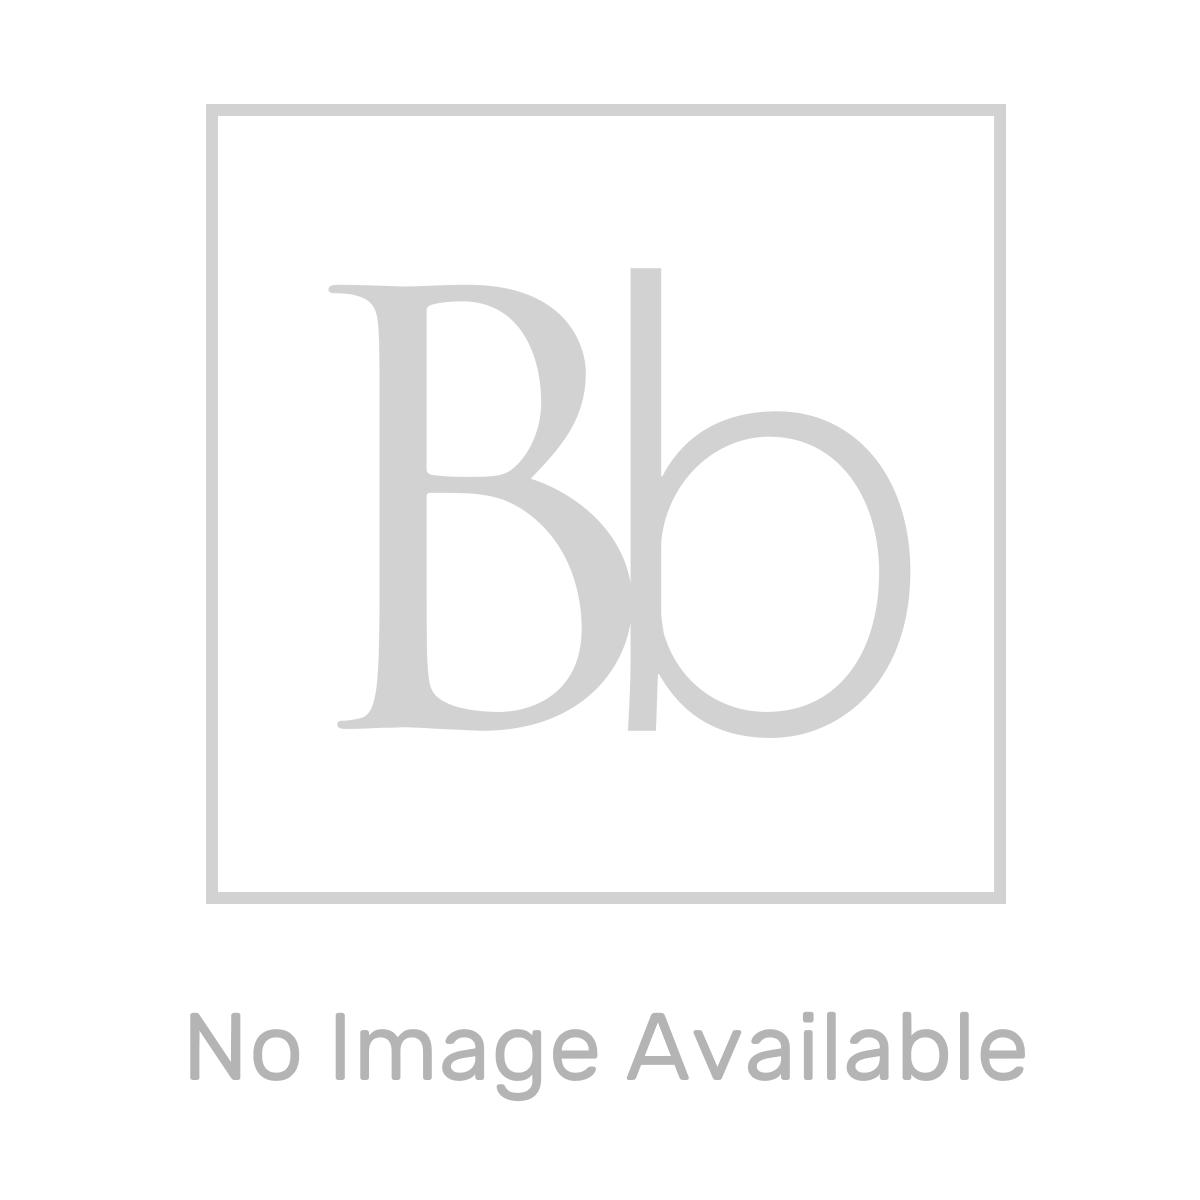 Nuie Blocks Satin Blue 2 Door/1 Drawer Floor Standing Vanity Unit with 40mm Profile Basin 600mm